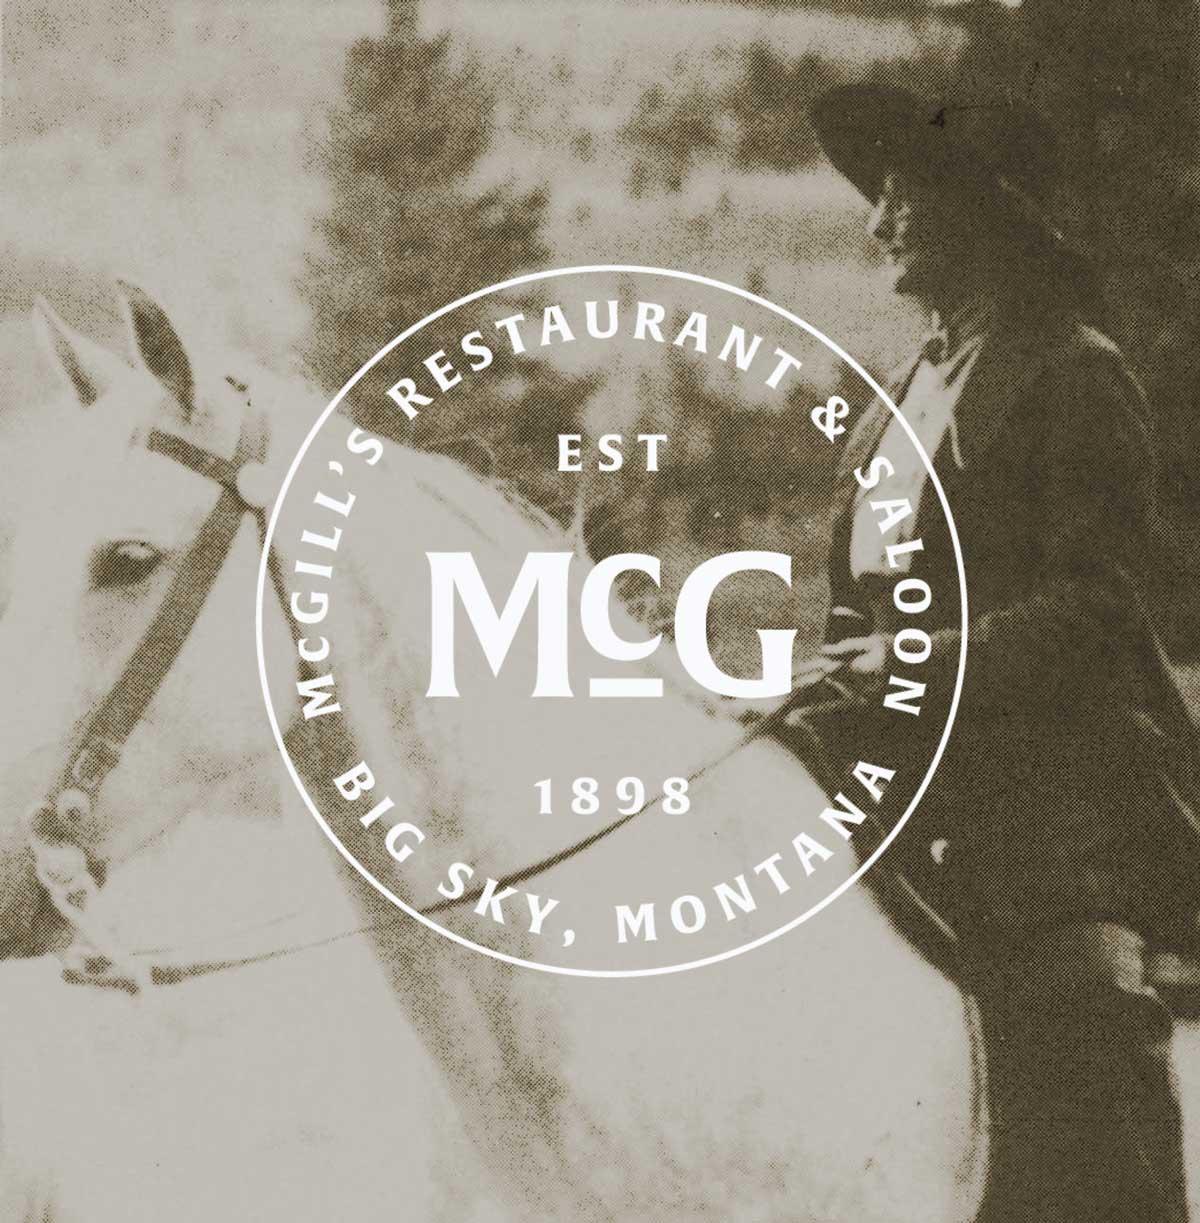 McGill's Restaurant and Saloon